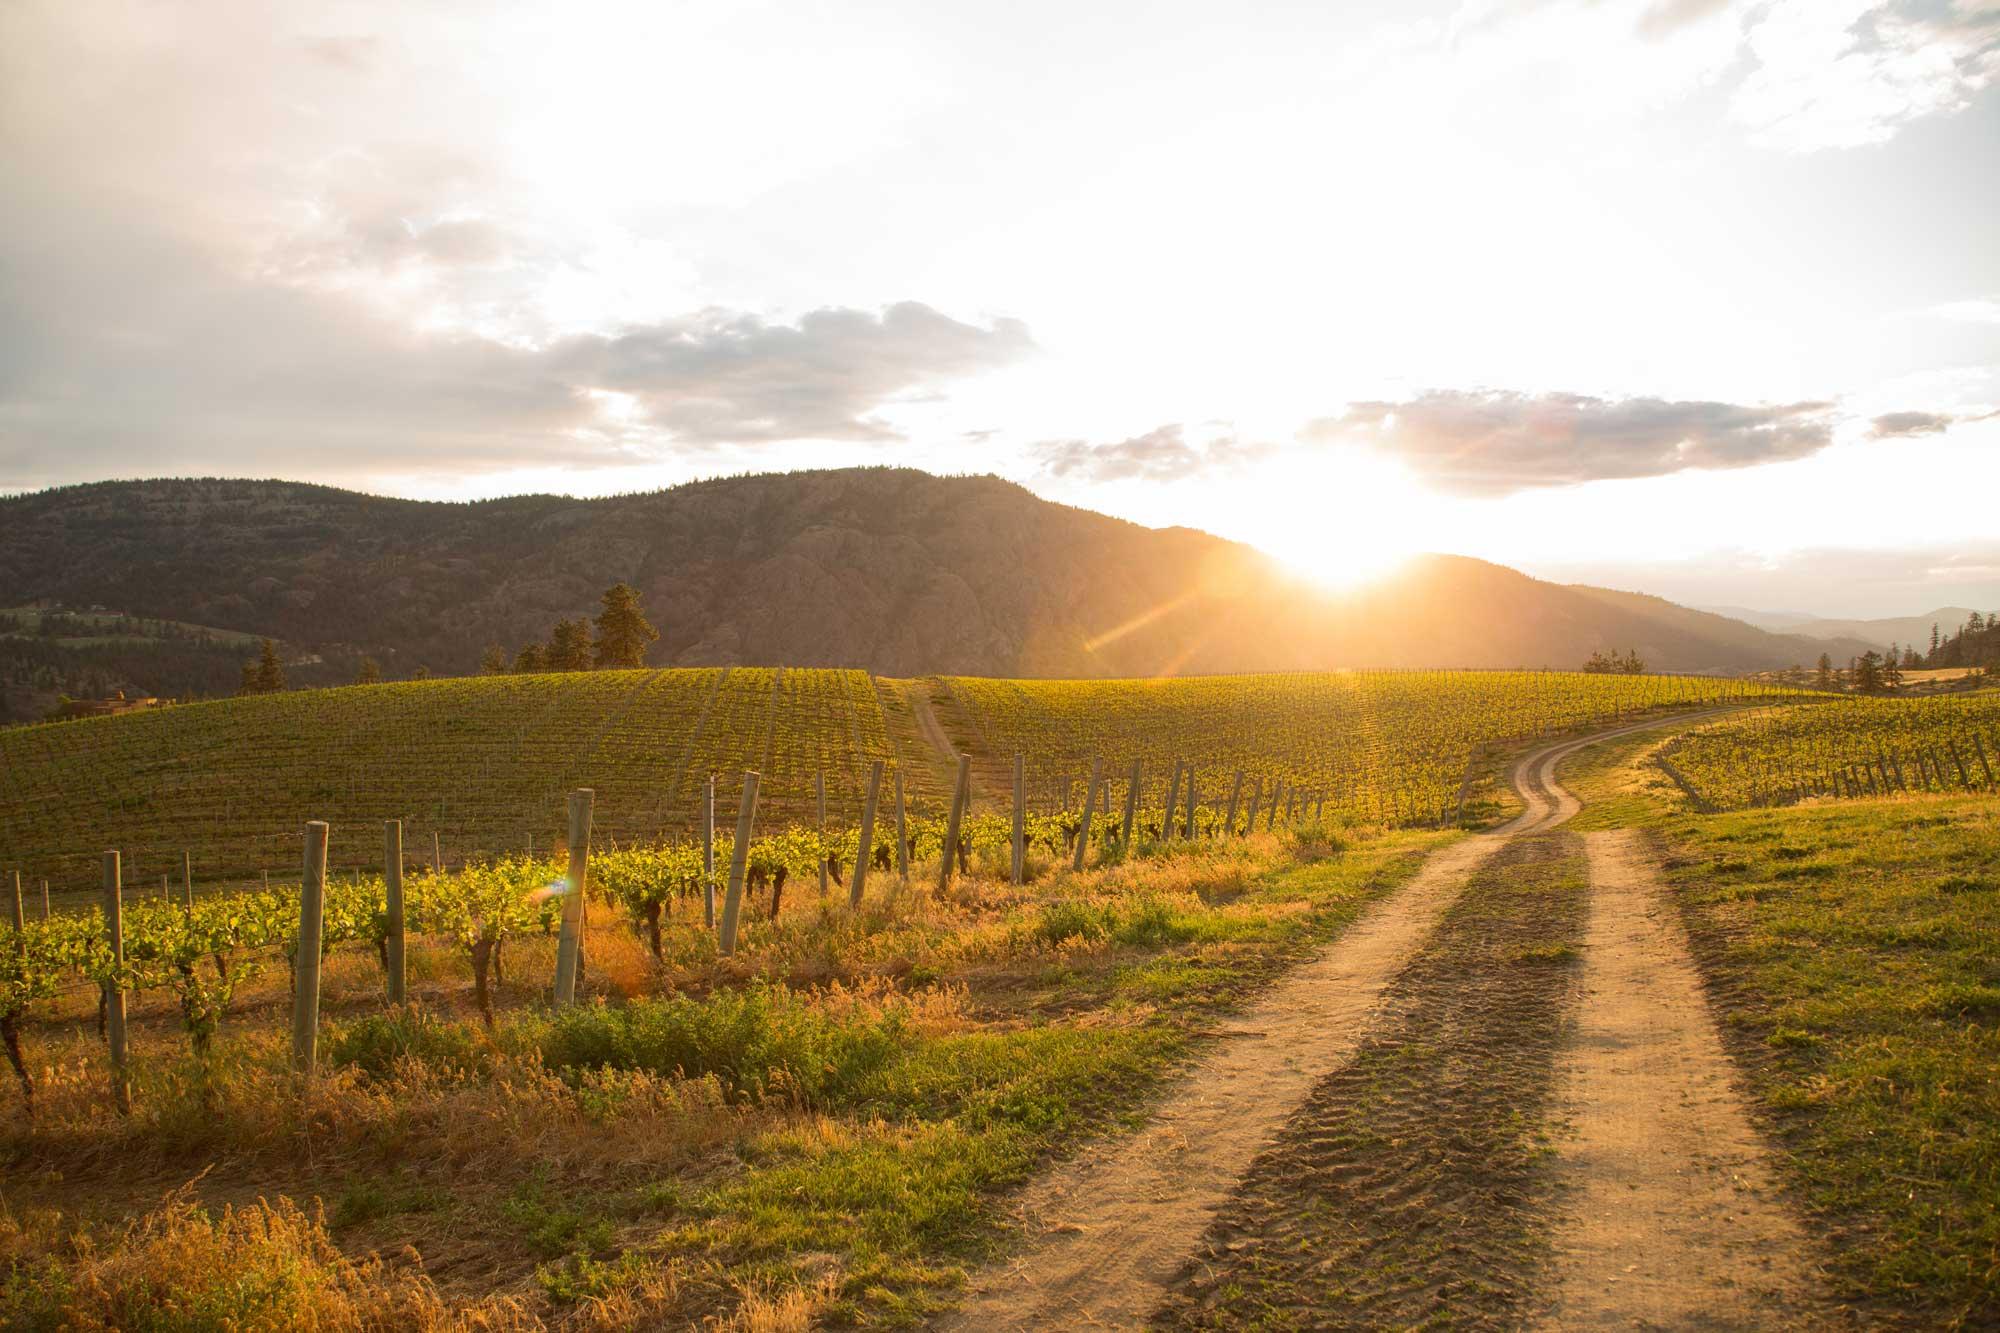 wine-photographer-chris-stenberg-7341.jpg